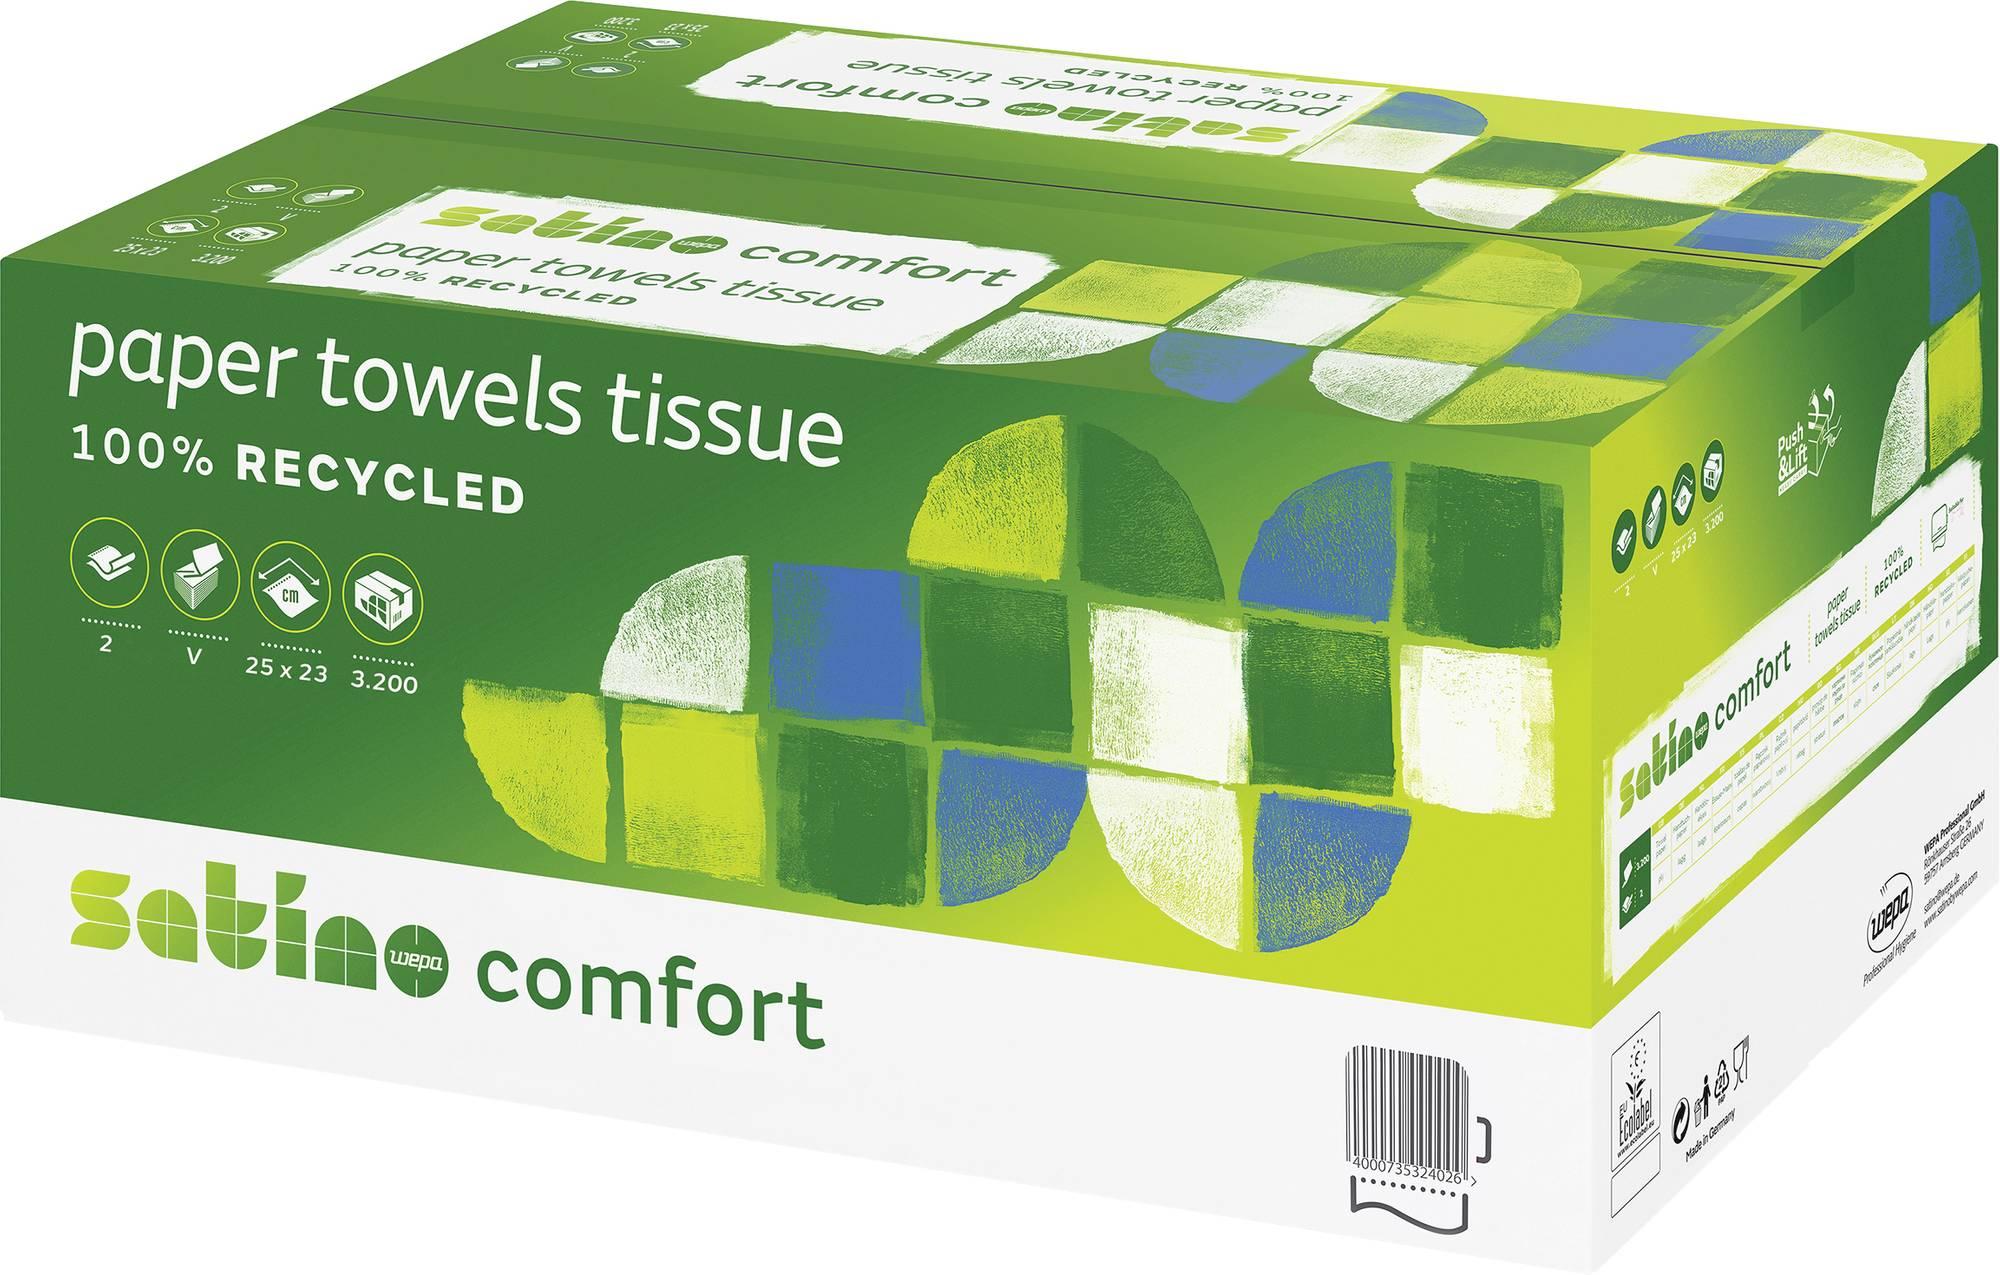 Wepa Satino Comfort Papierhandtuch 2-lagig